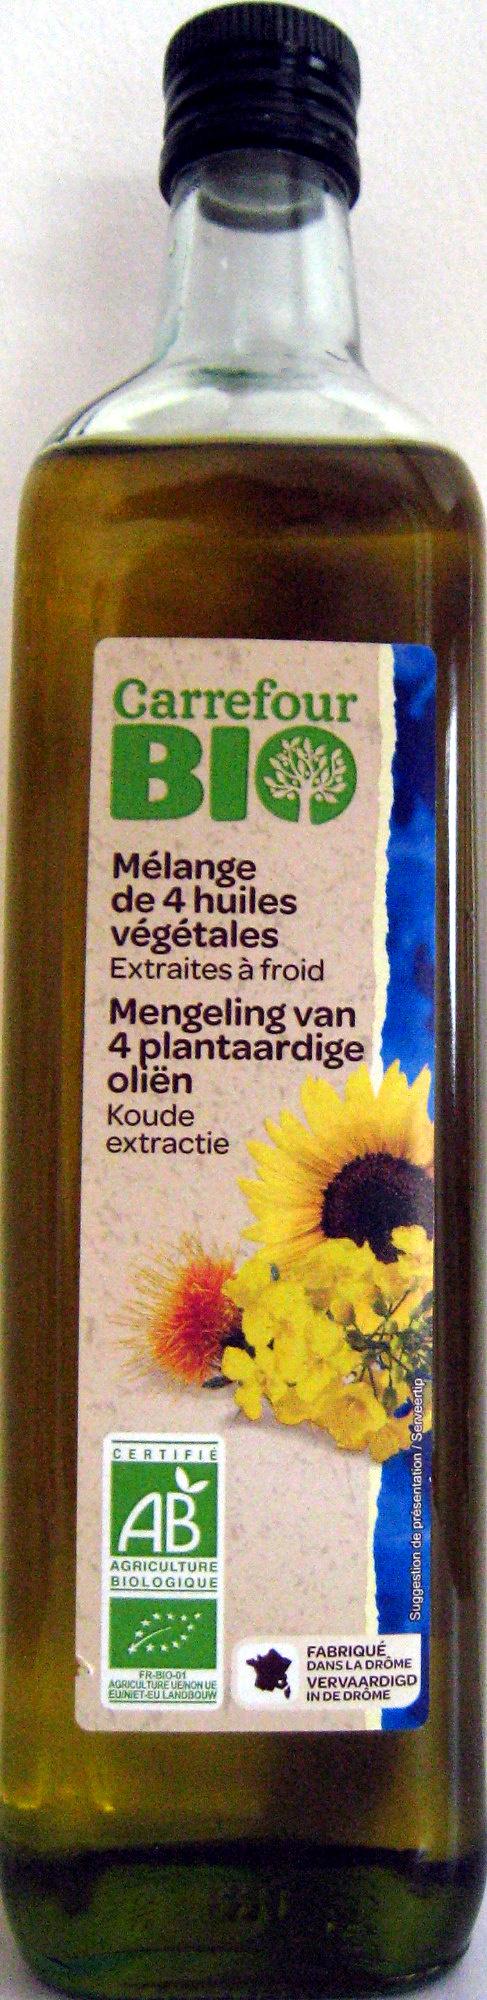 huile colza bio carrefour